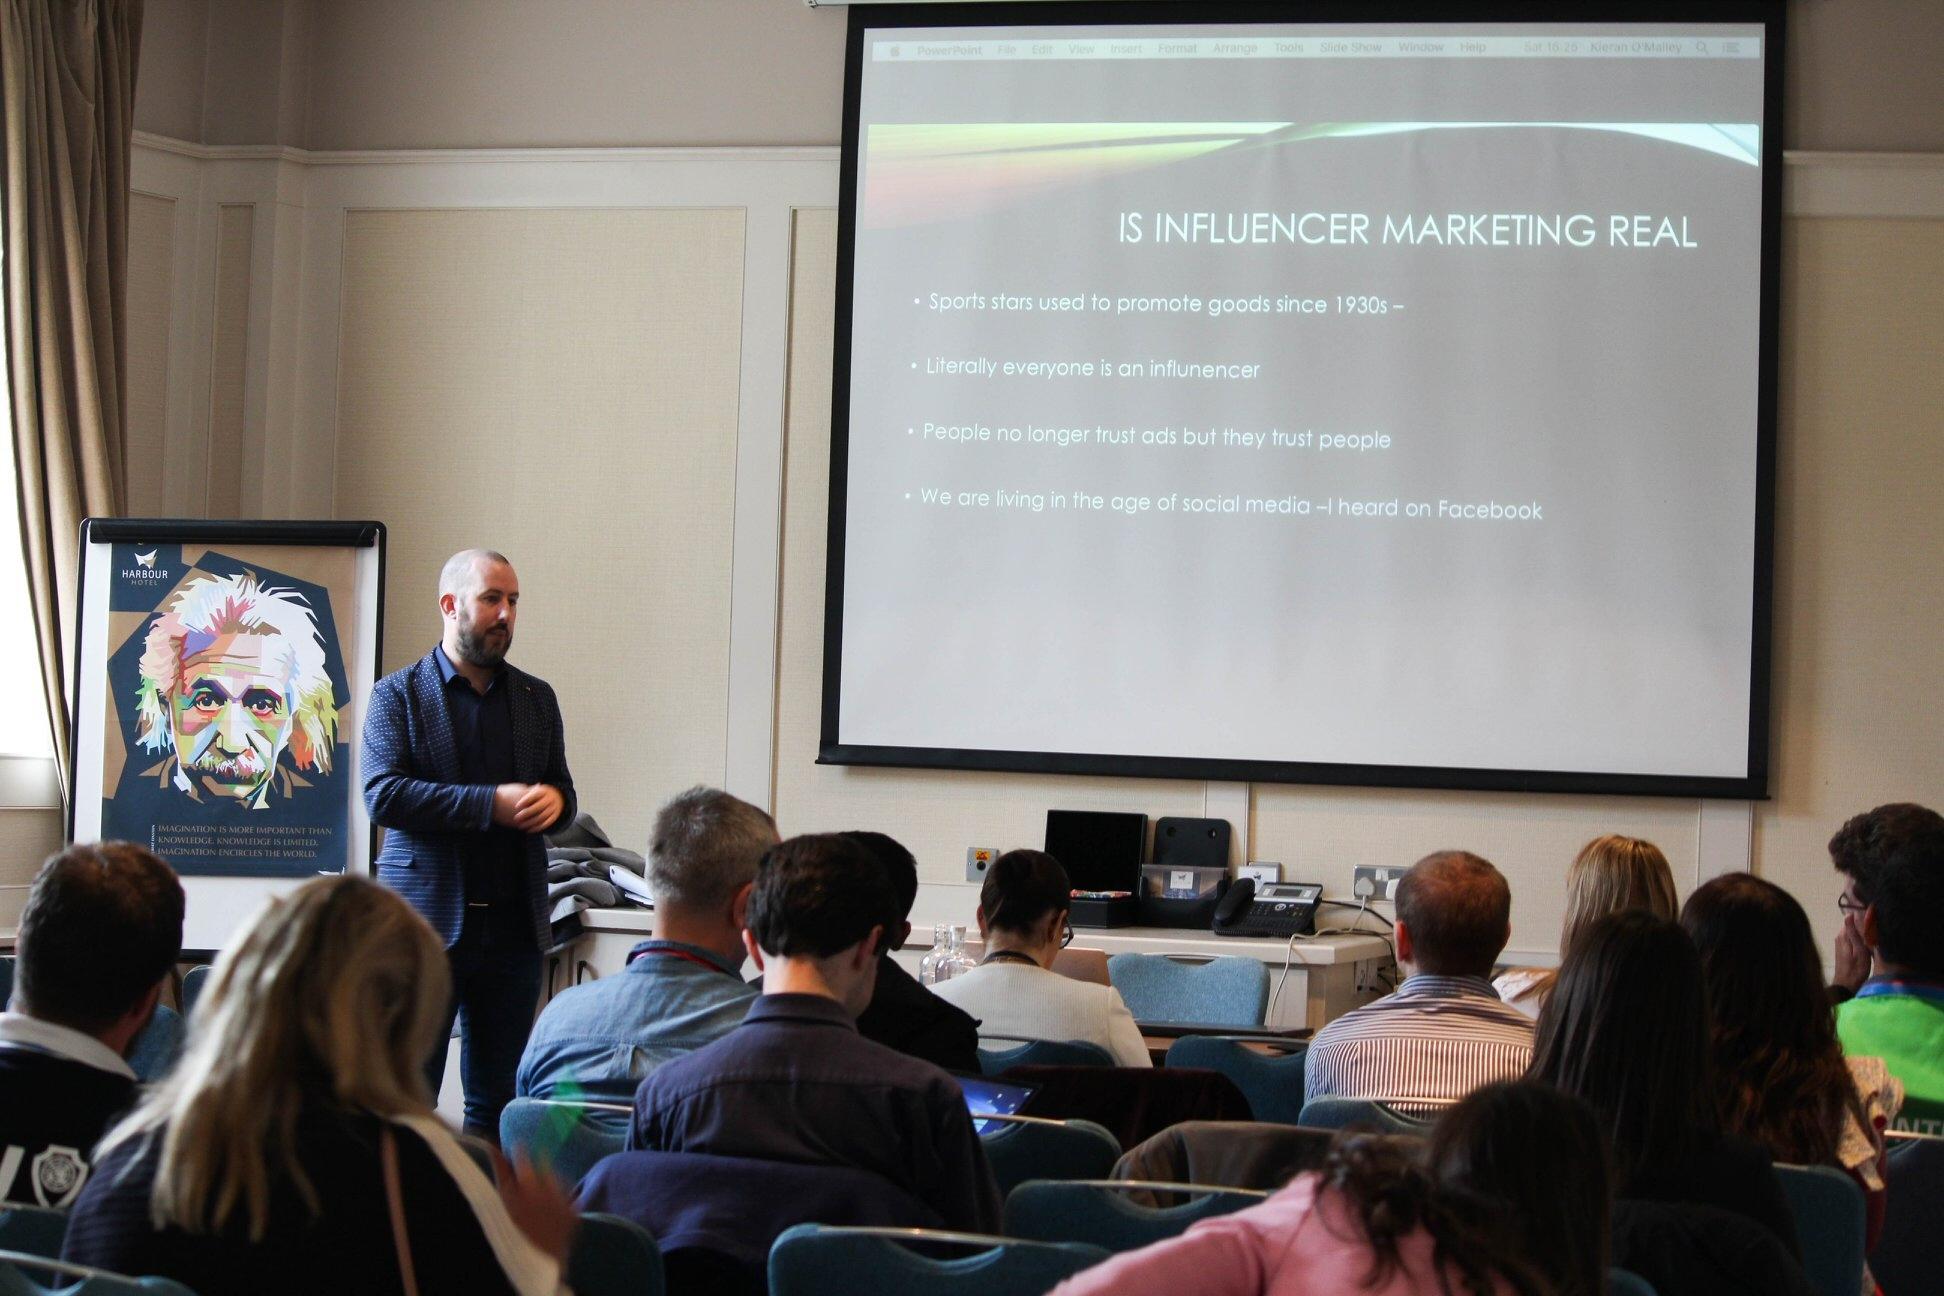 February Members Meeting and Social Media Training